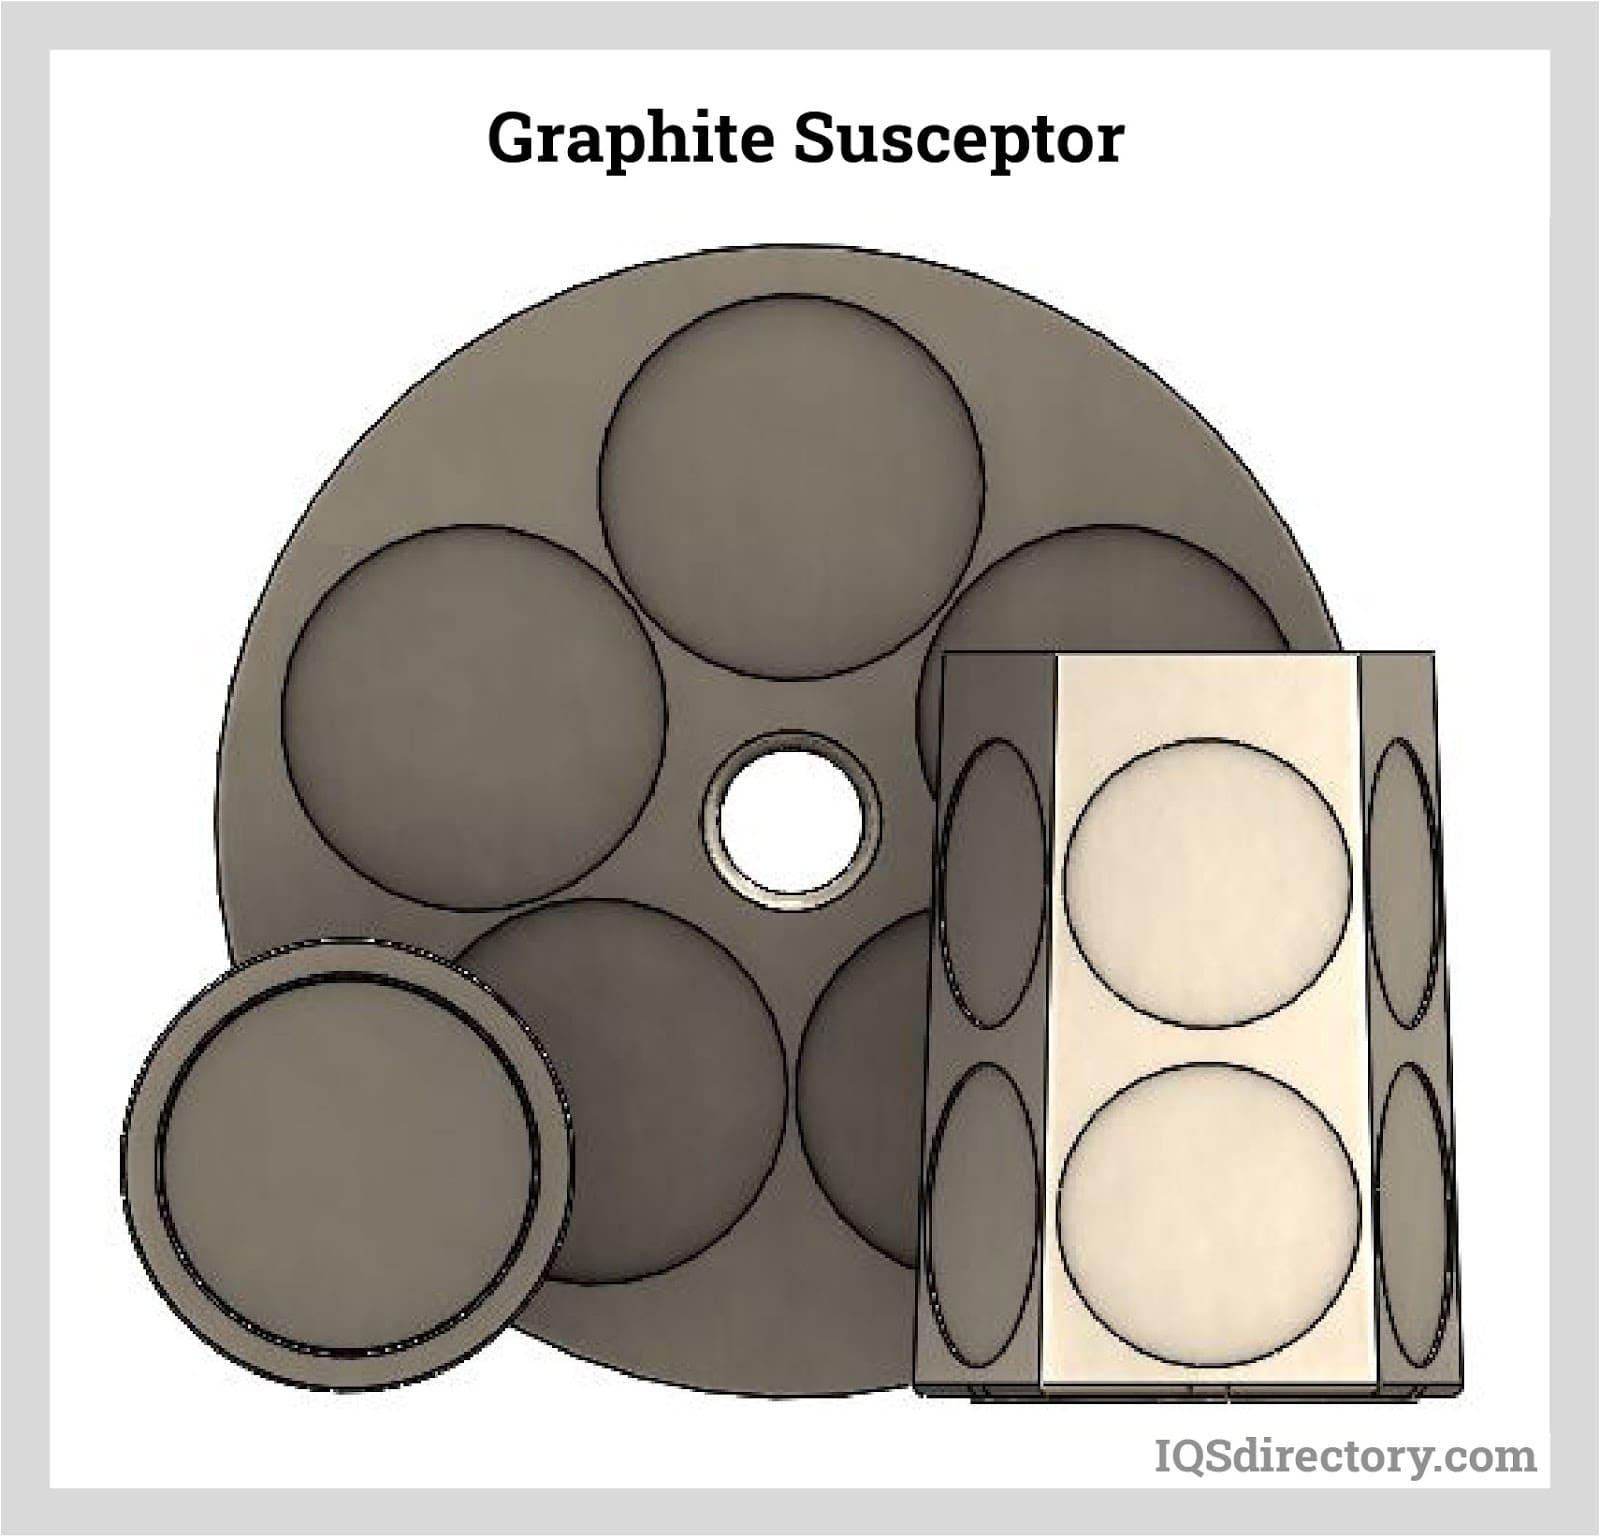 Graphite Susceptor